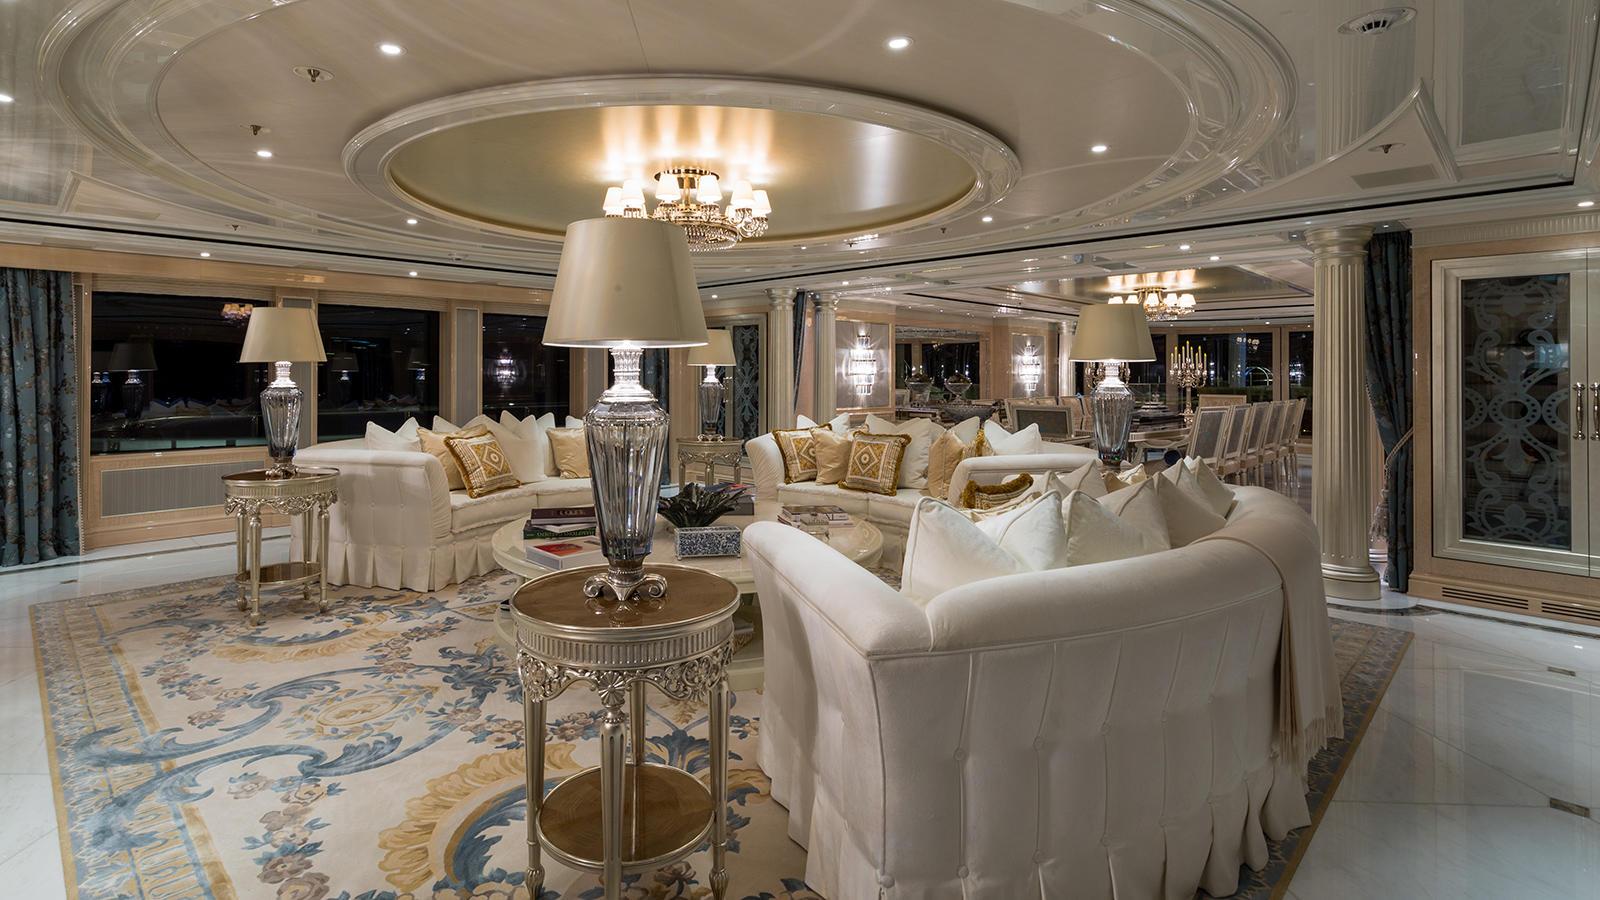 lxgIOPUhTWmrJRFCPgIE_Plvs-Vltra-Amels-LE242-yacht-main-deck-saloon-credit-Jeff-Brown-1600x900